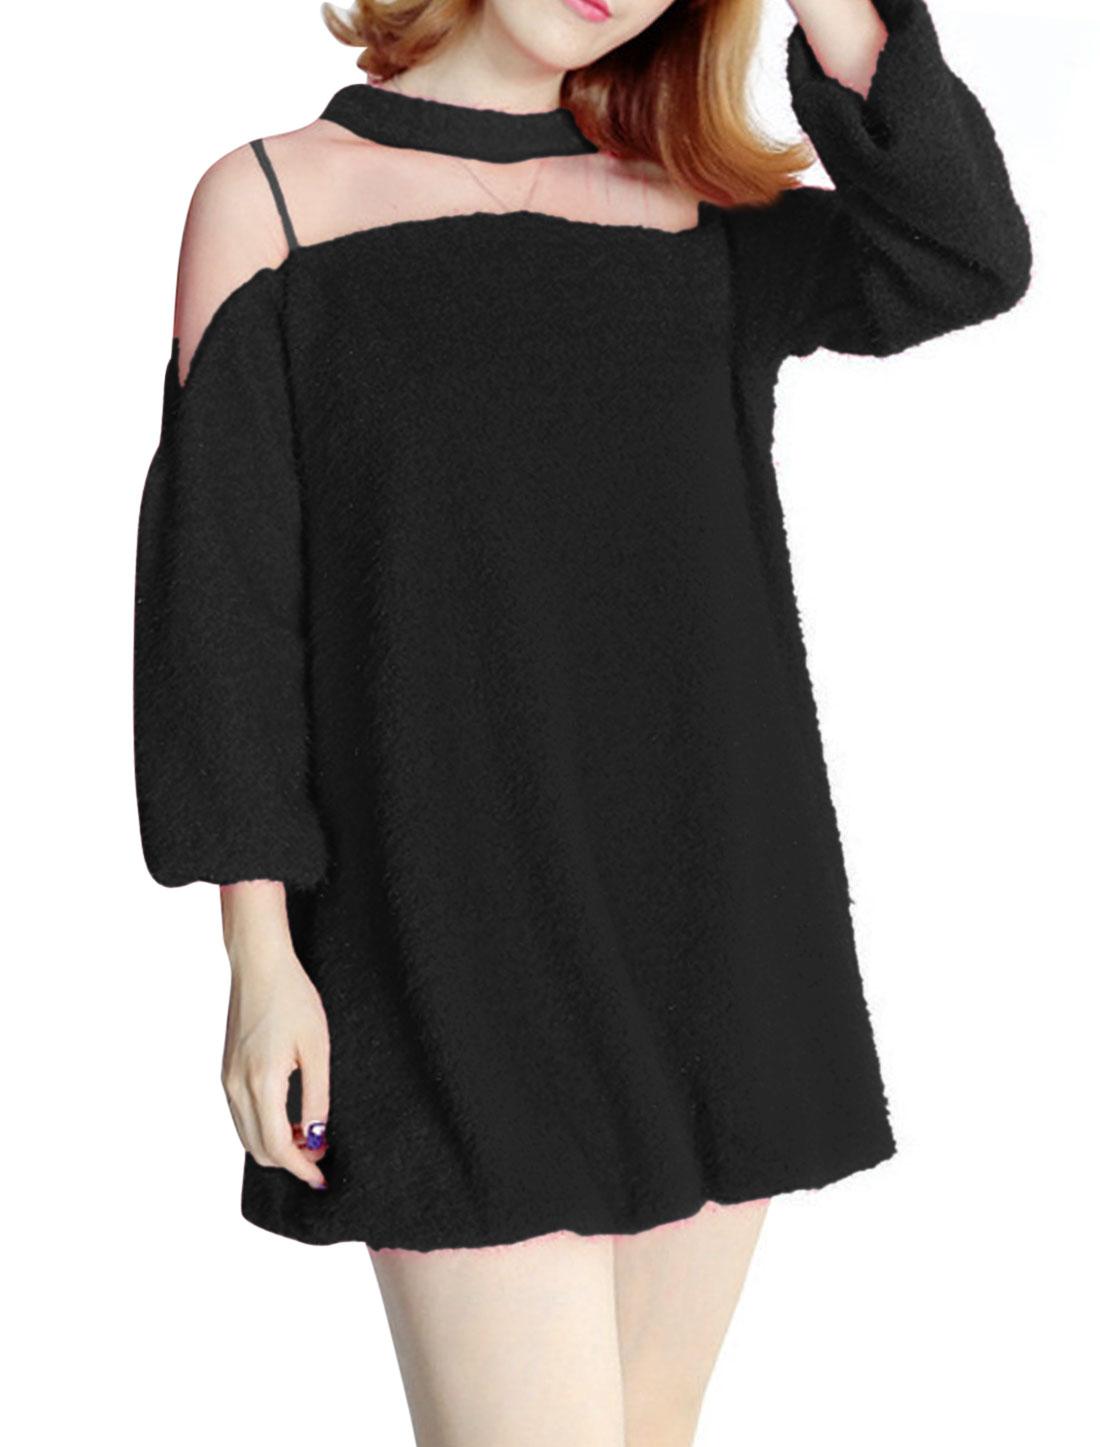 Women Semi-sheer Mesh Panel 3/4 Sleeves Tunic Top Black XS